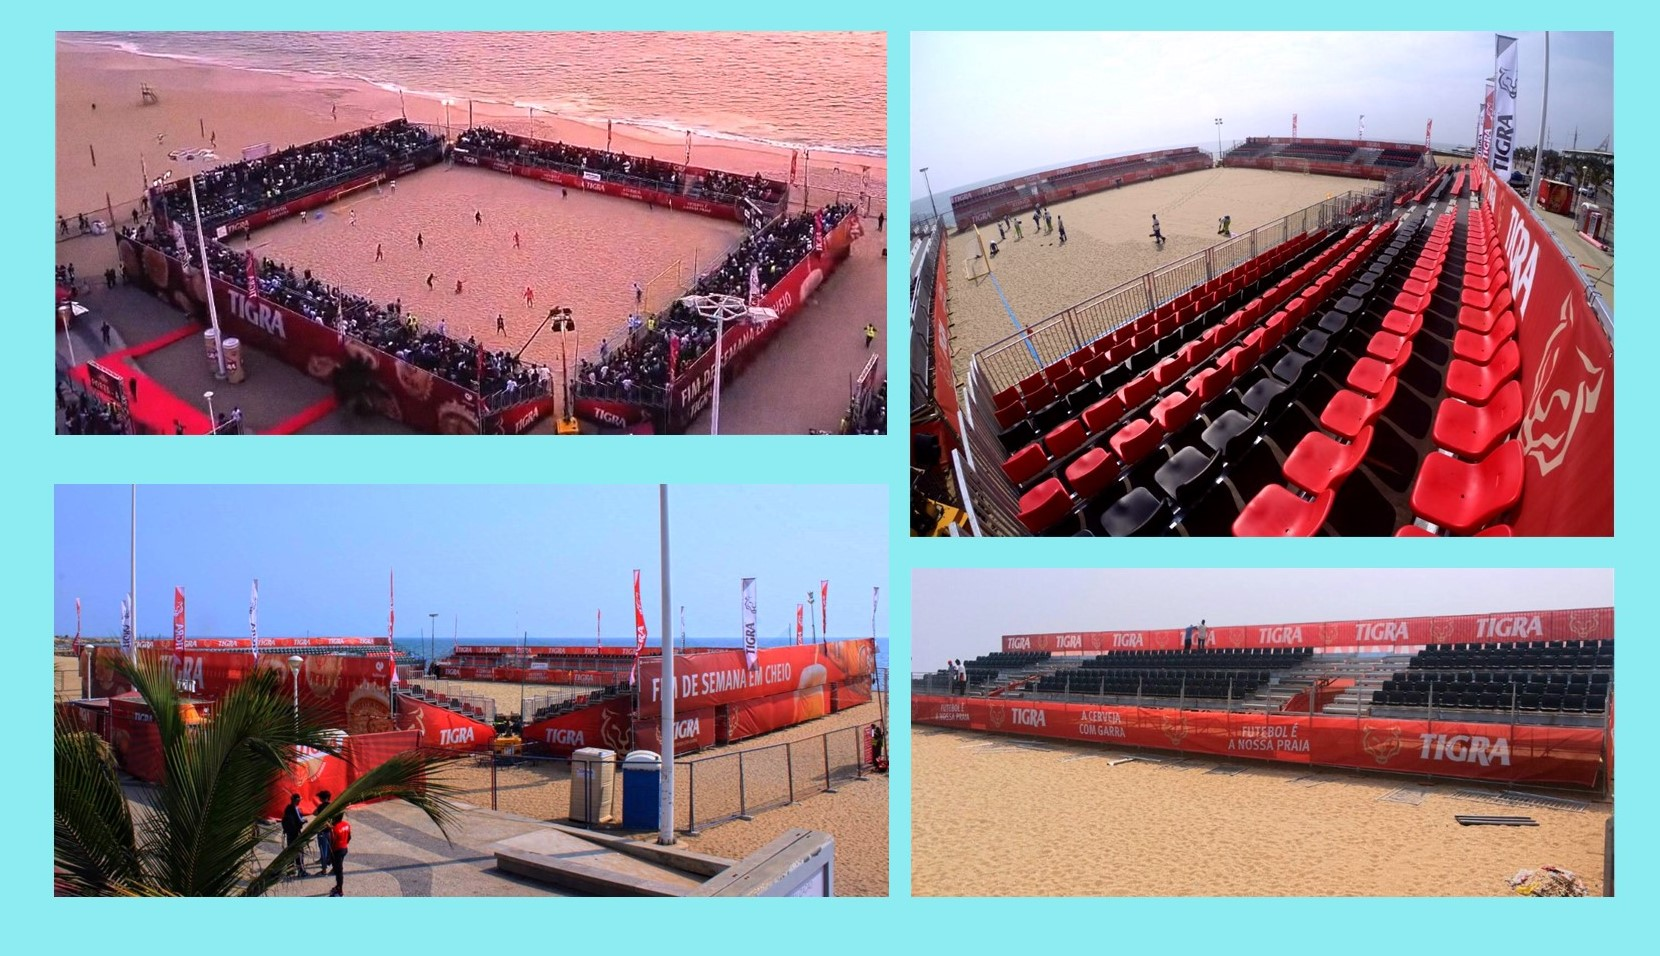 beach soccer Angola 2019 modular stadium